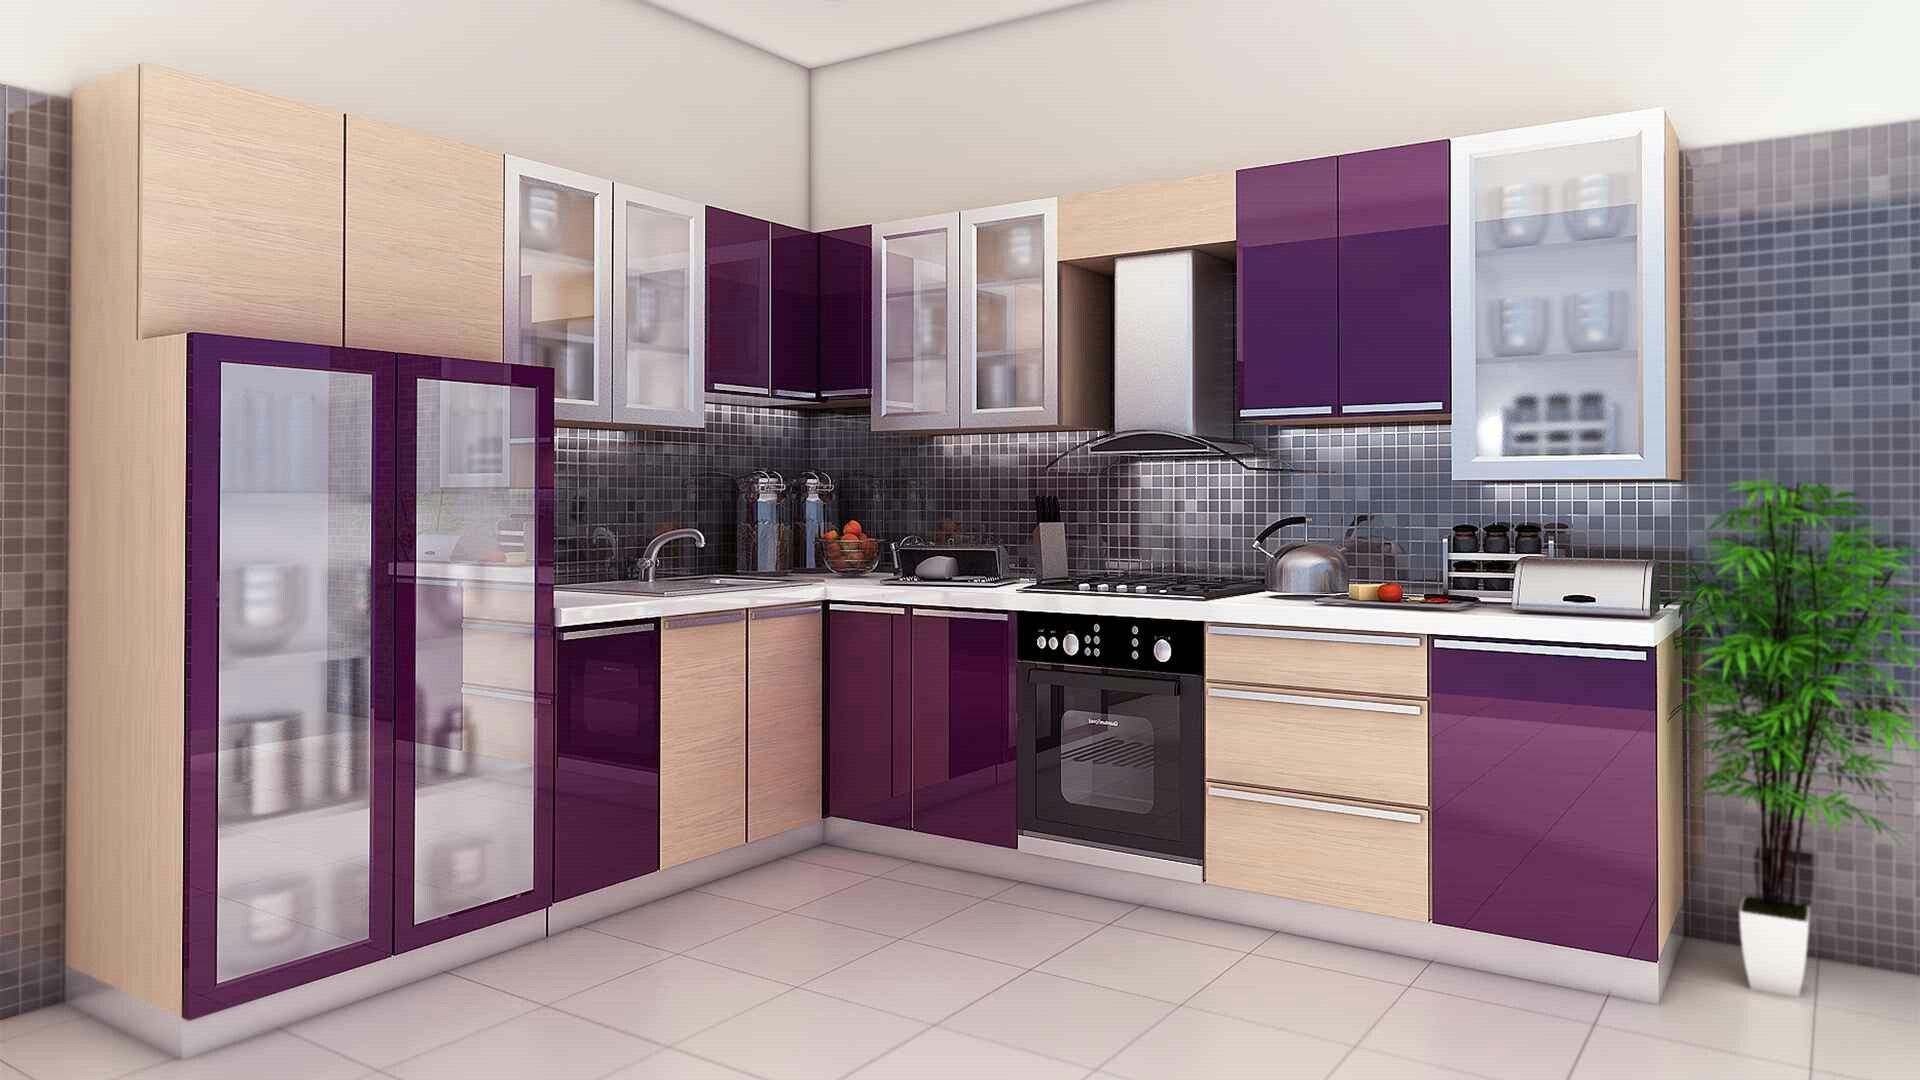 Pinполицин Роман On Interior Design  Pinterest Best Design Of Modular Kitchen Cabinets Decorating Design